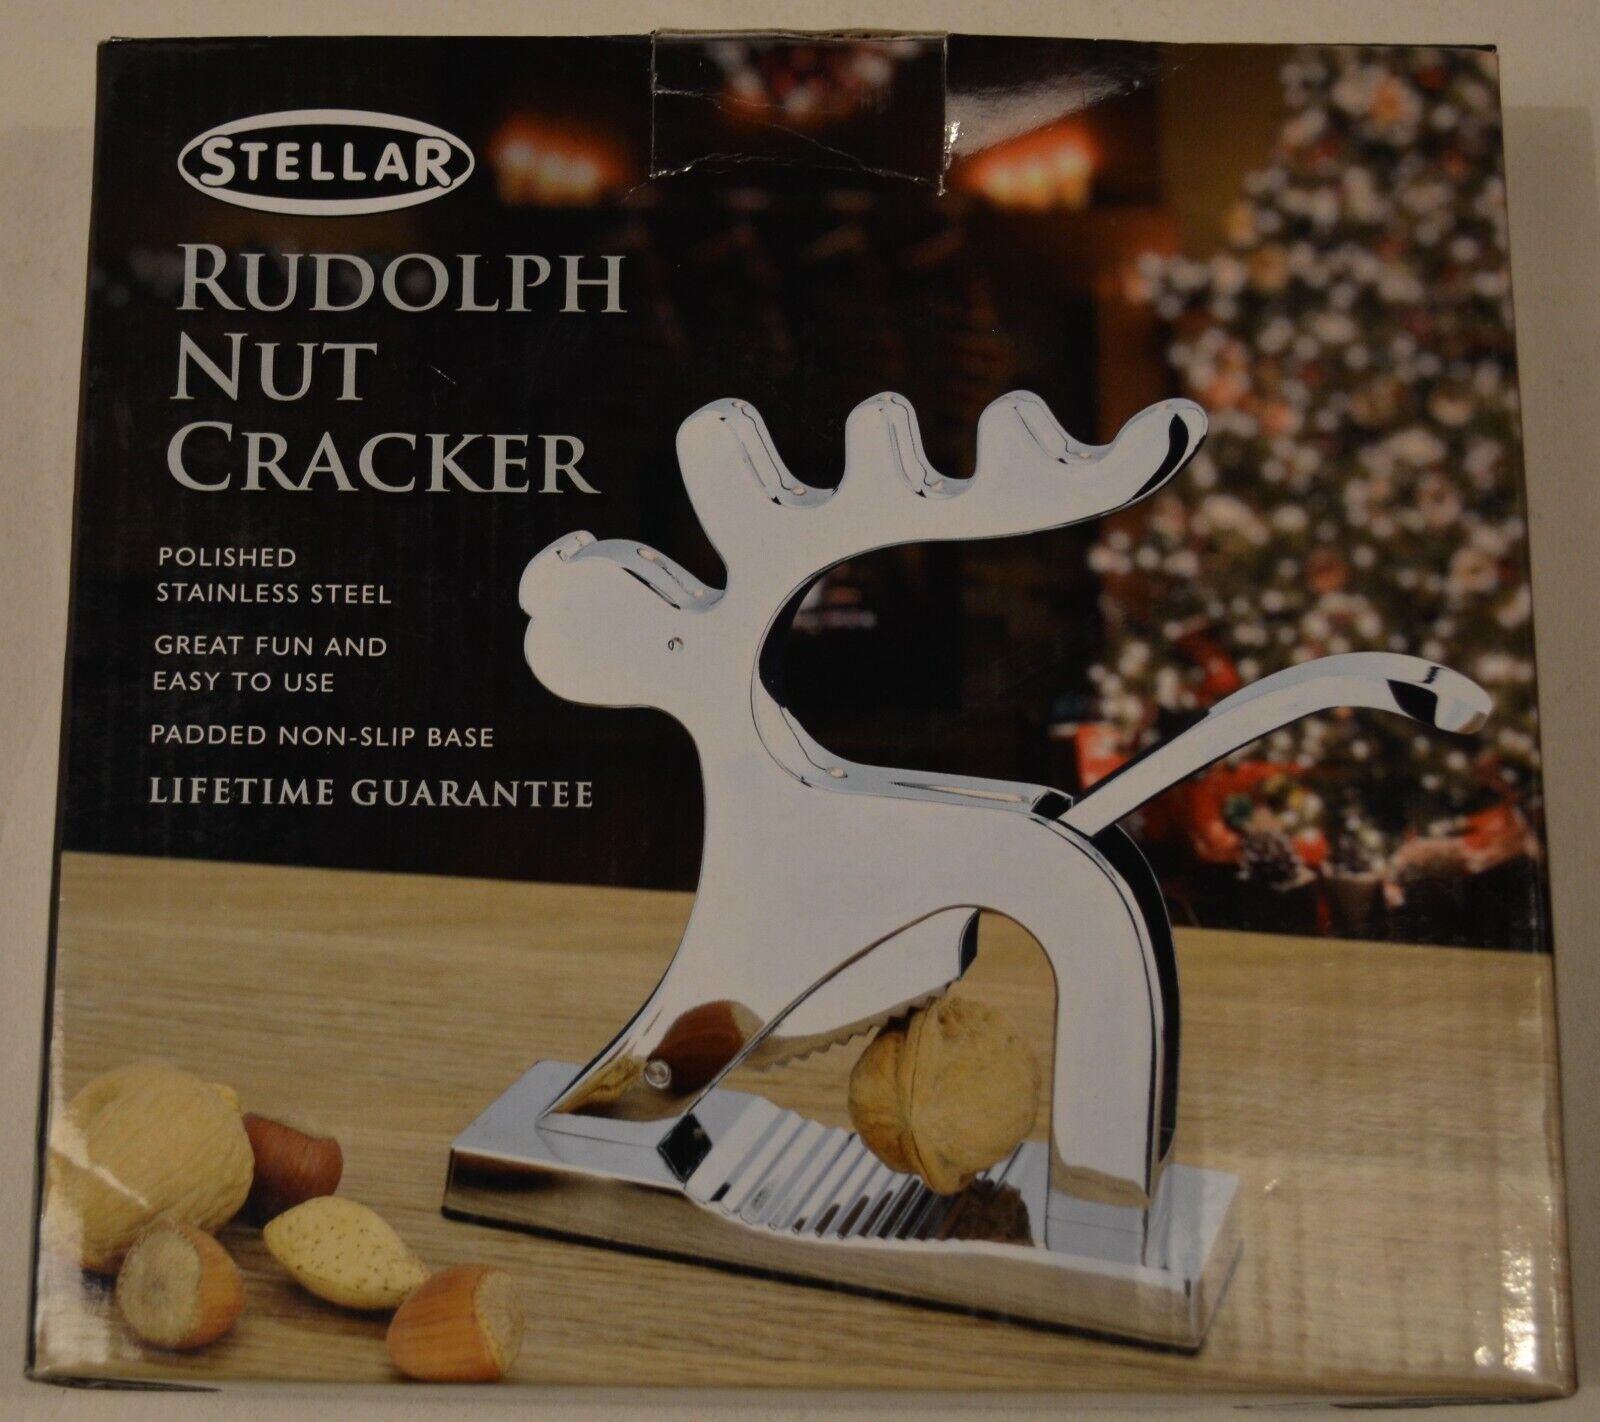 STELLAR STAINLESS STEEL RUDOLPH NUT CRACKER PP412